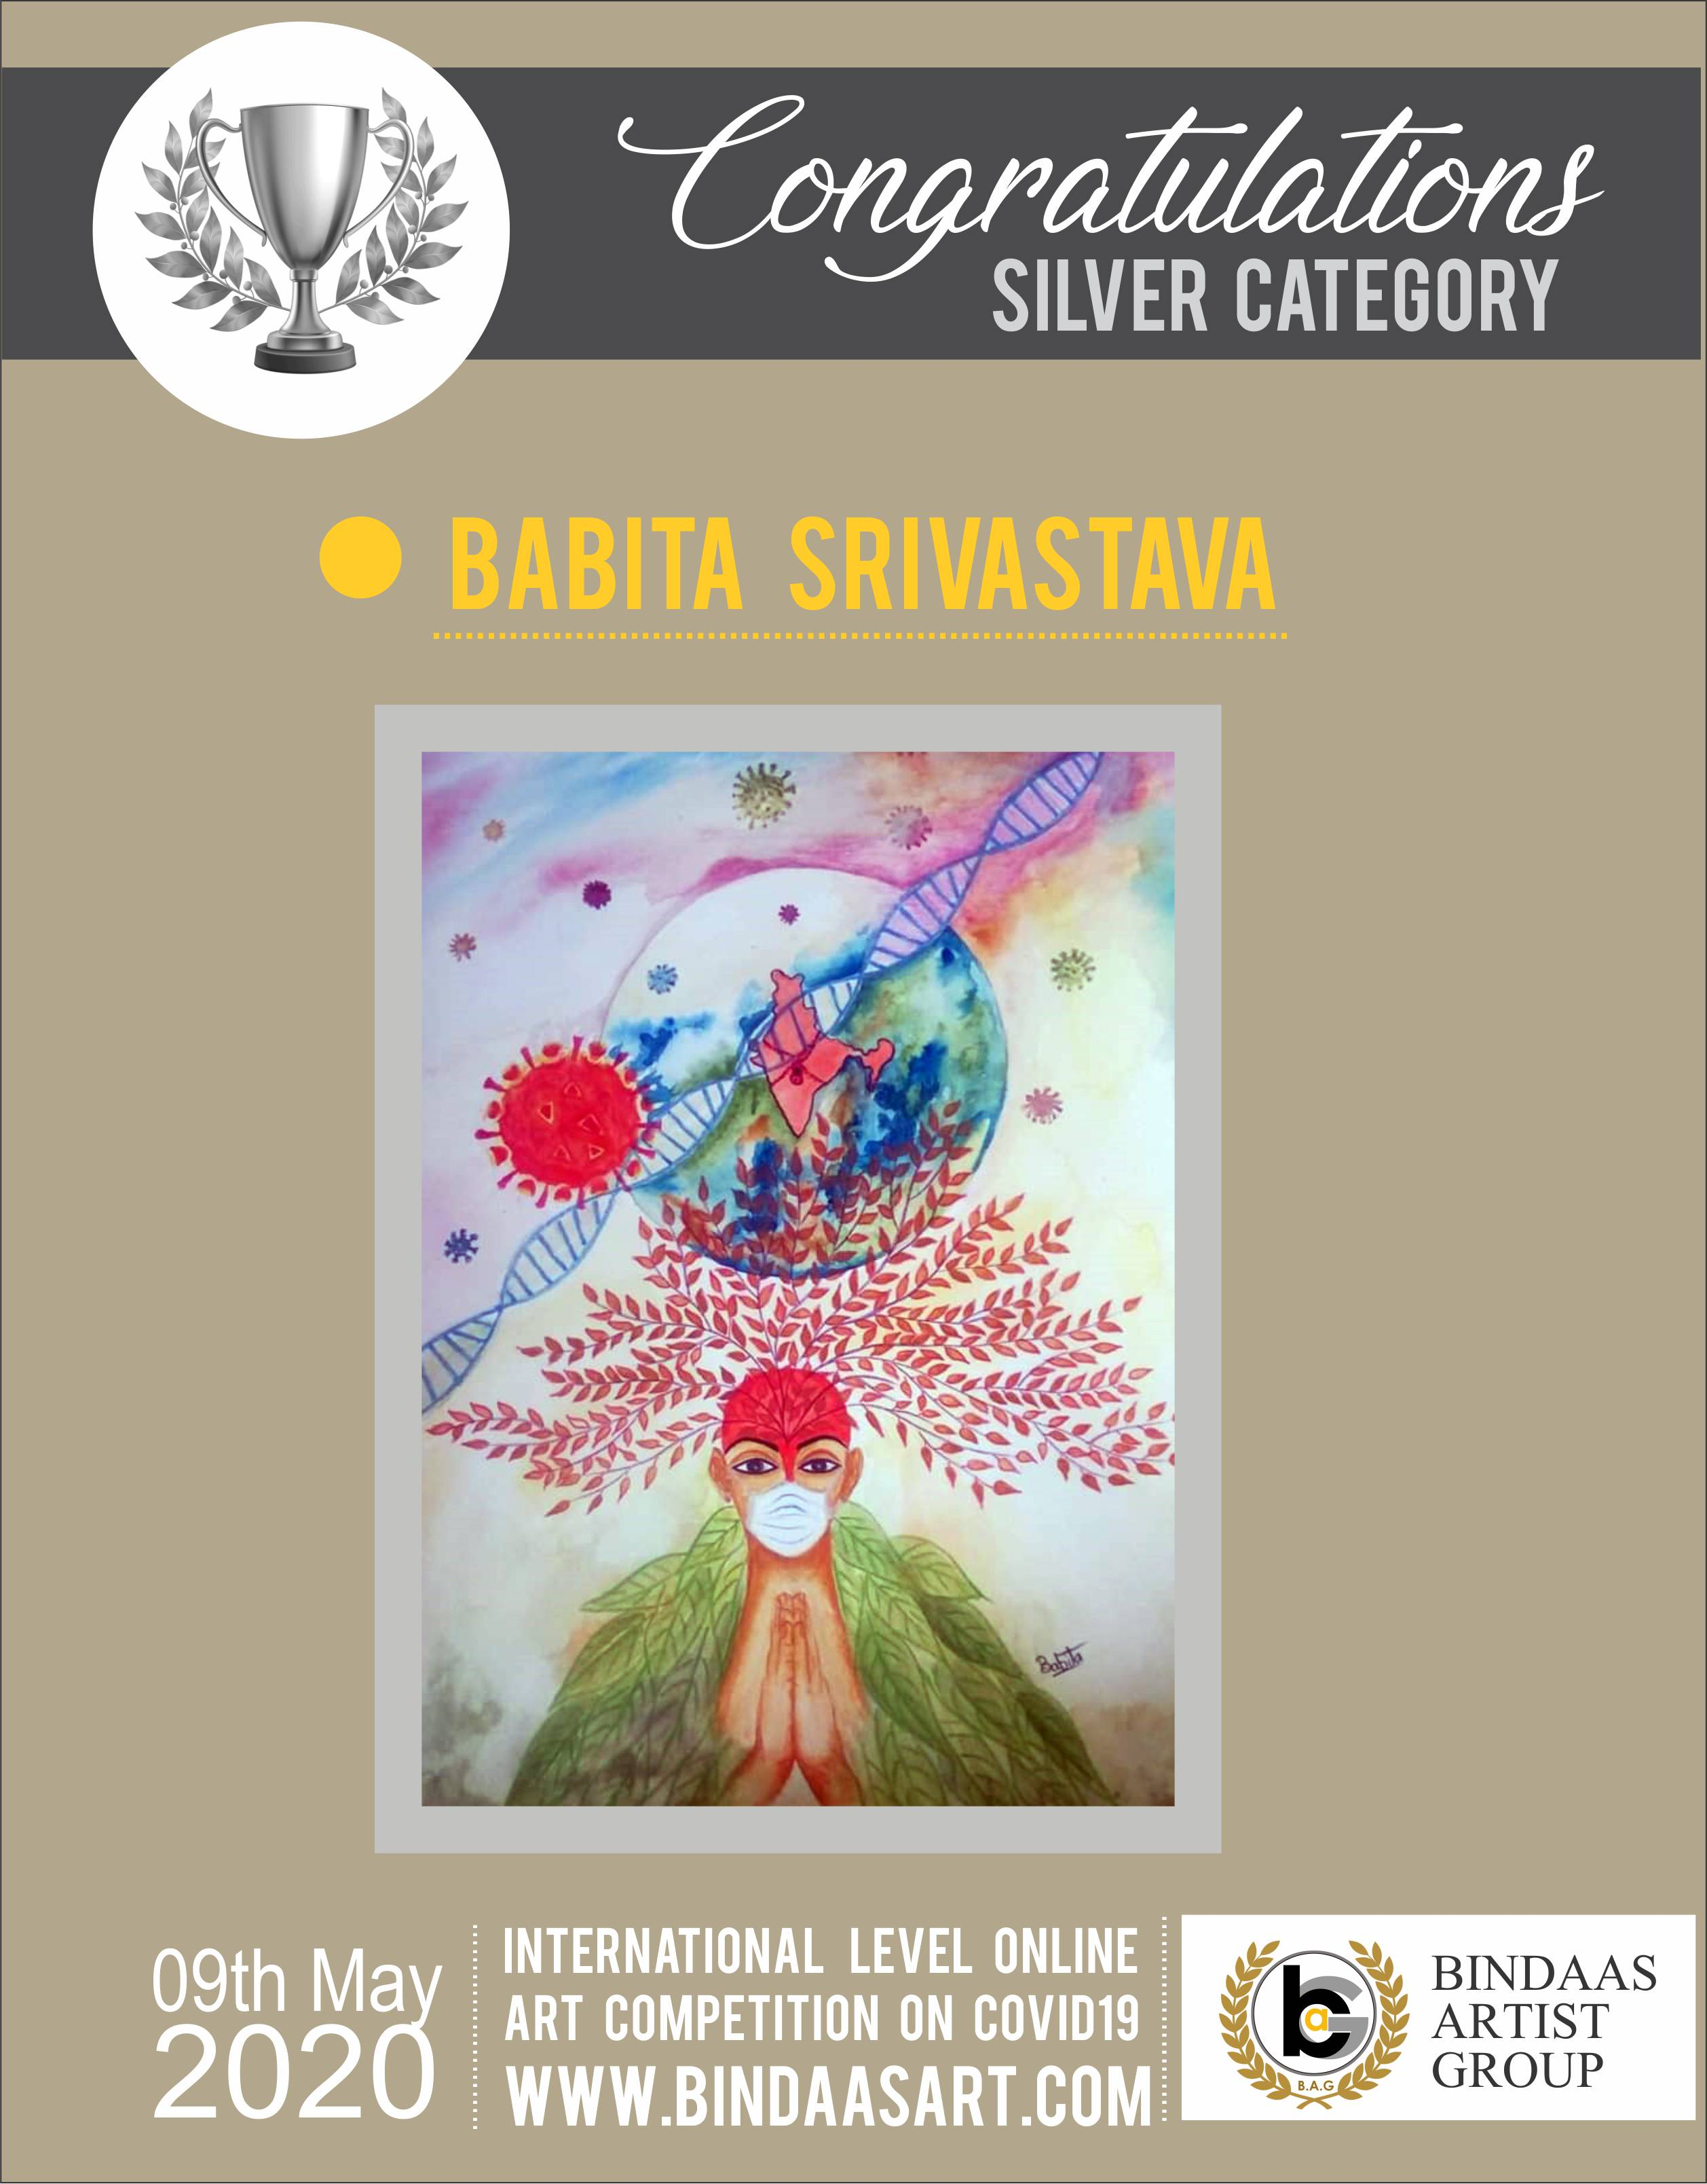 Babita Srivastava